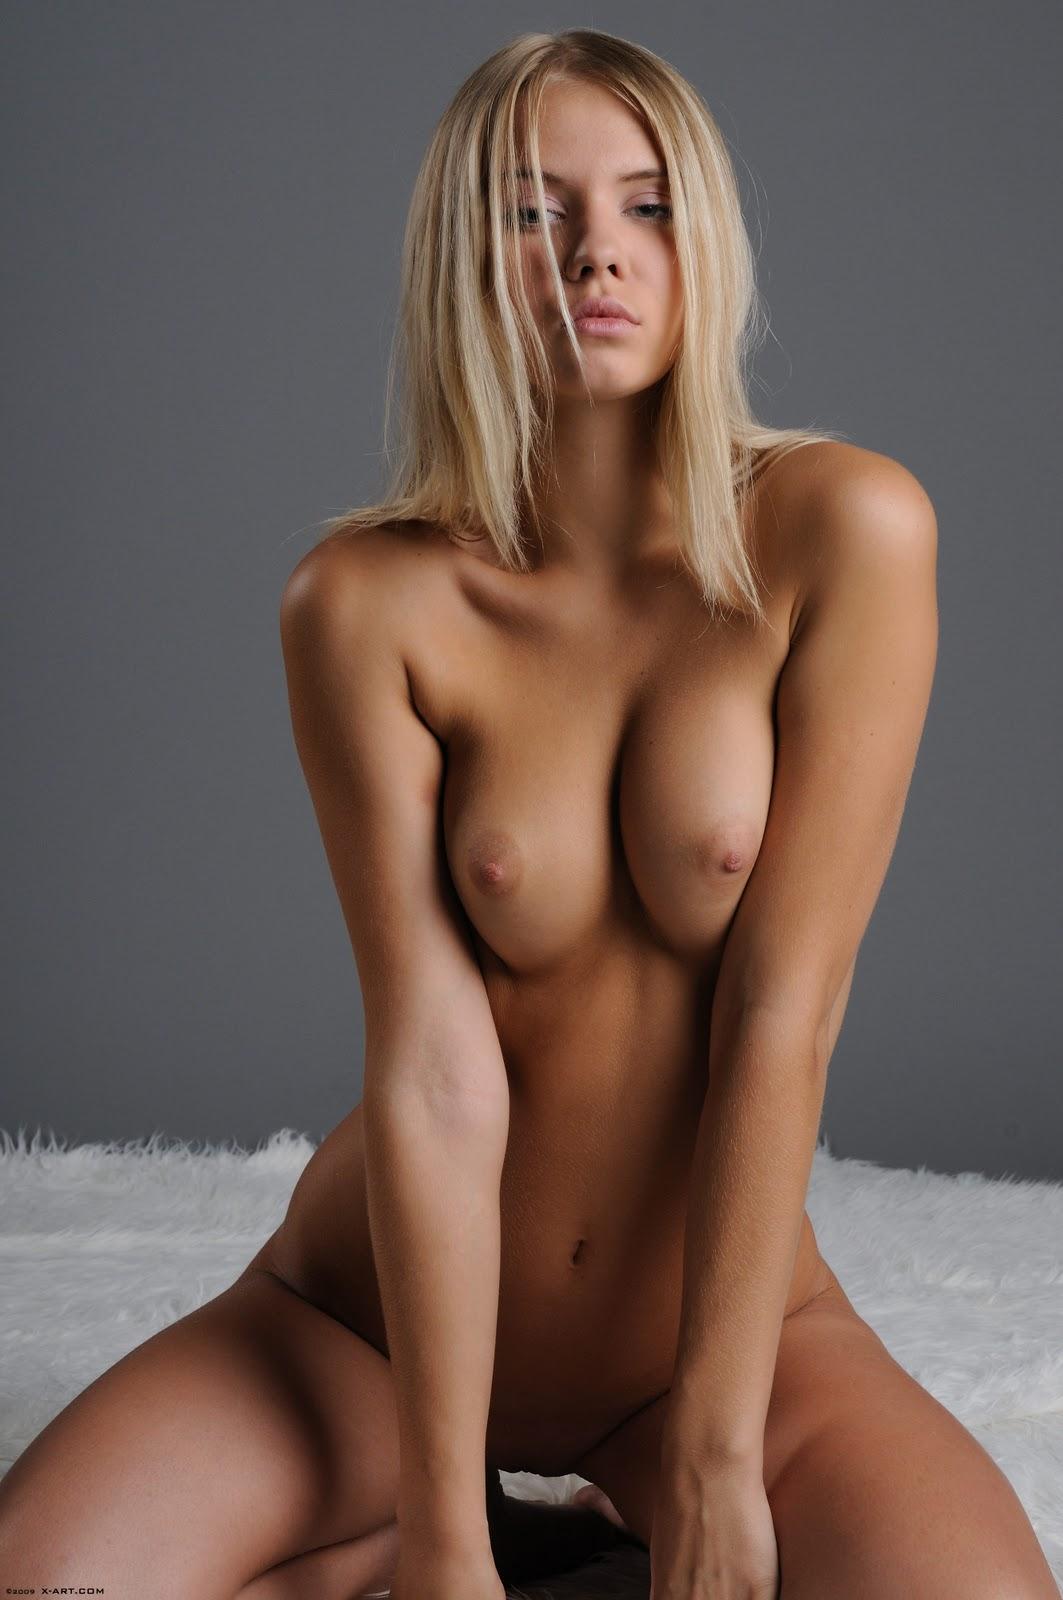 golie-modeli-foto